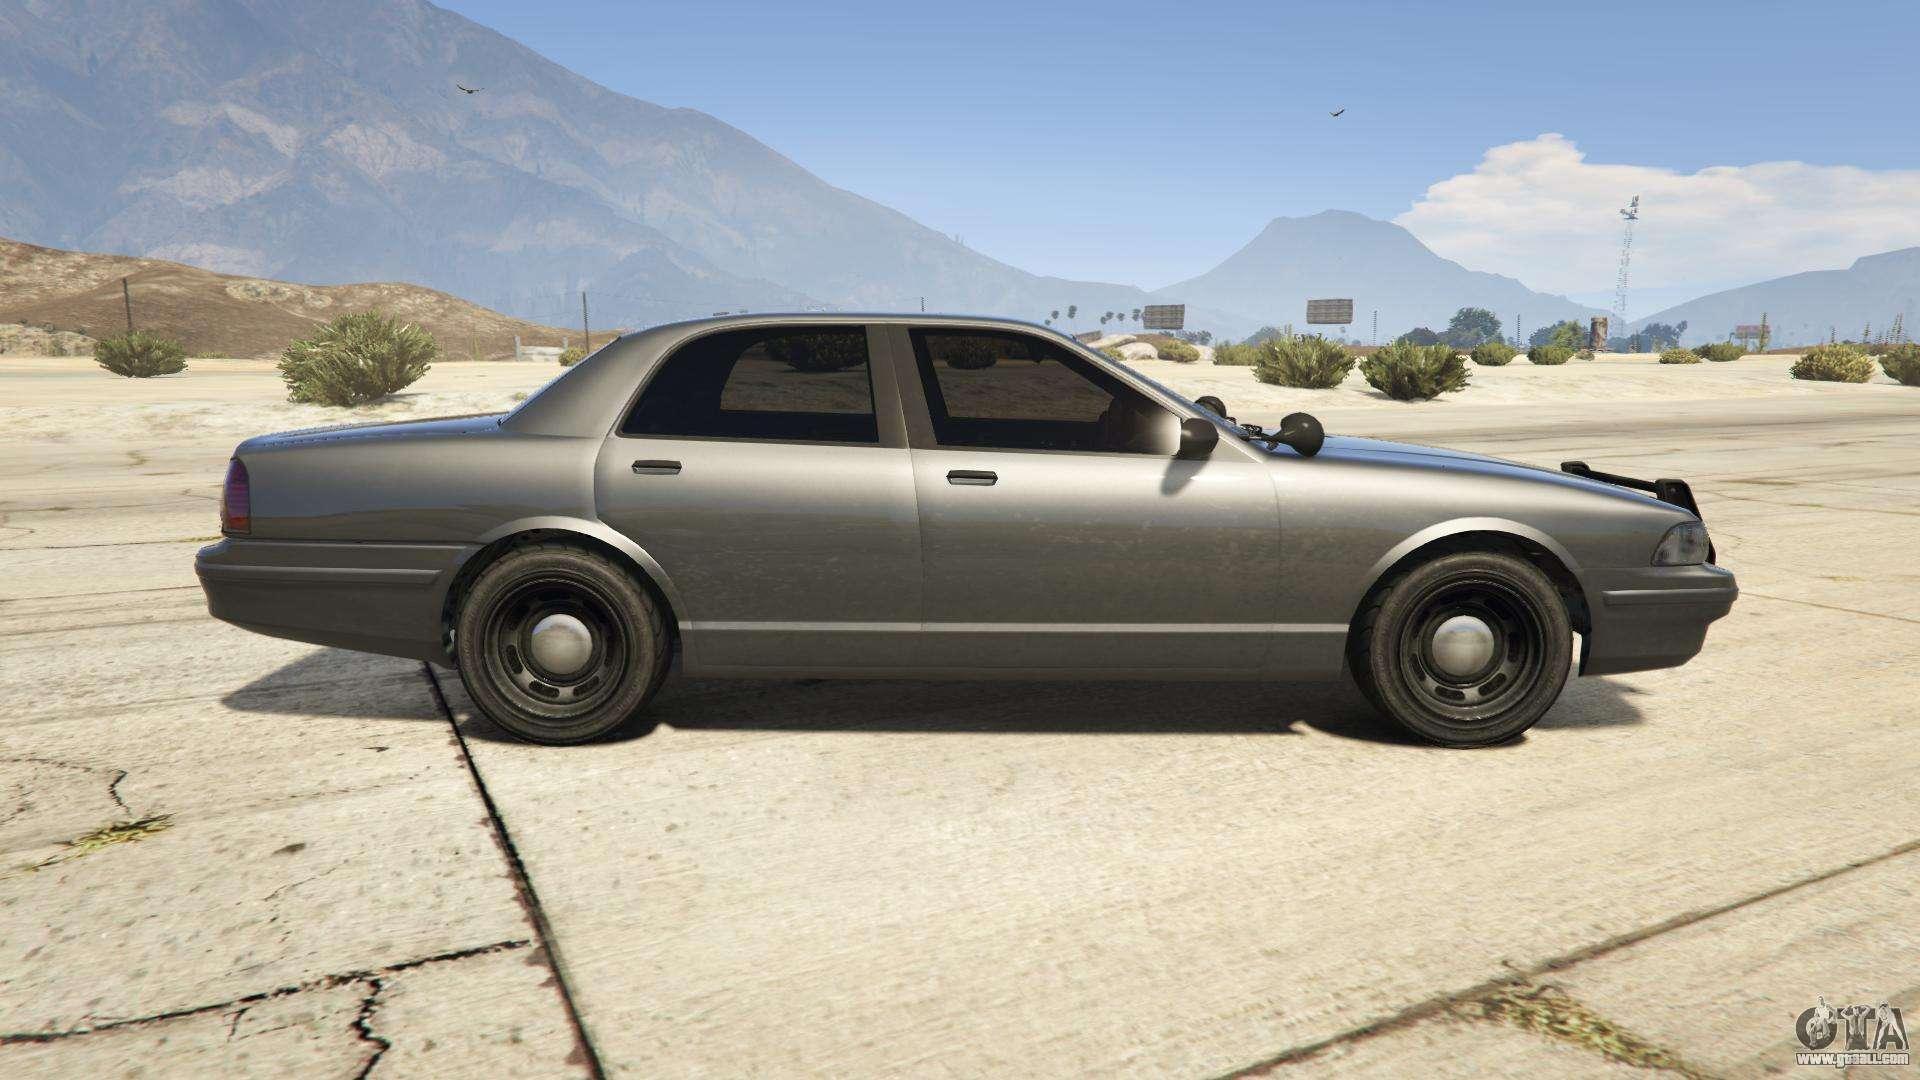 Unmarked police car gta 5 -  Gta 5 Vapid Unmarked Cruiser Side View